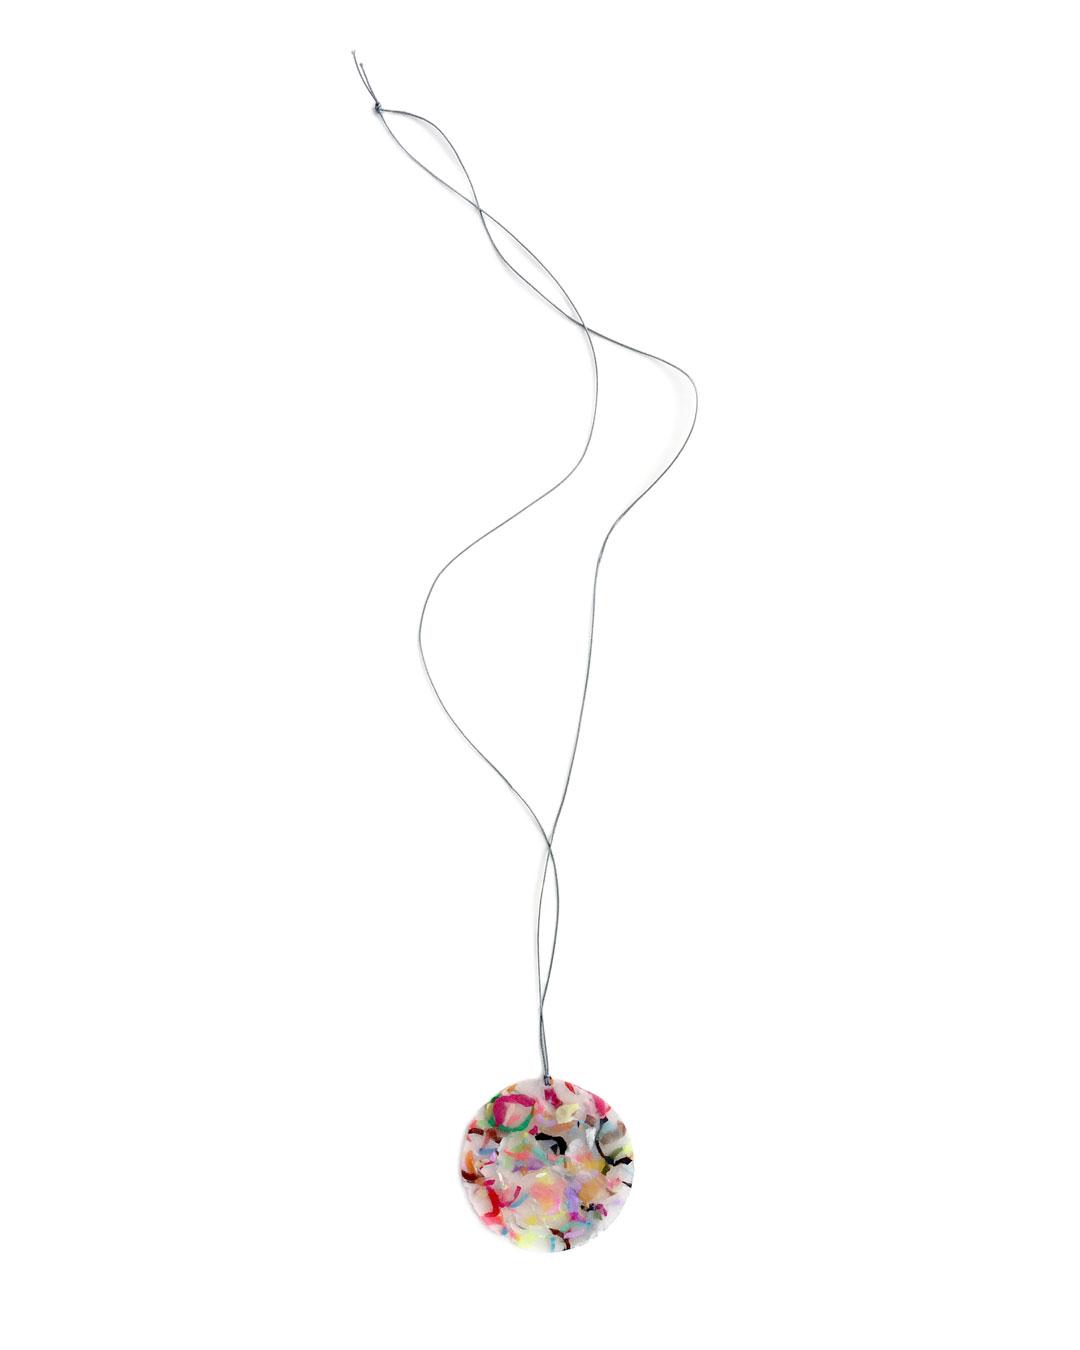 Karola Torkos, Shred, 2016, necklace; plastic, gold, Dyneema cord, ø 60 mm, €220